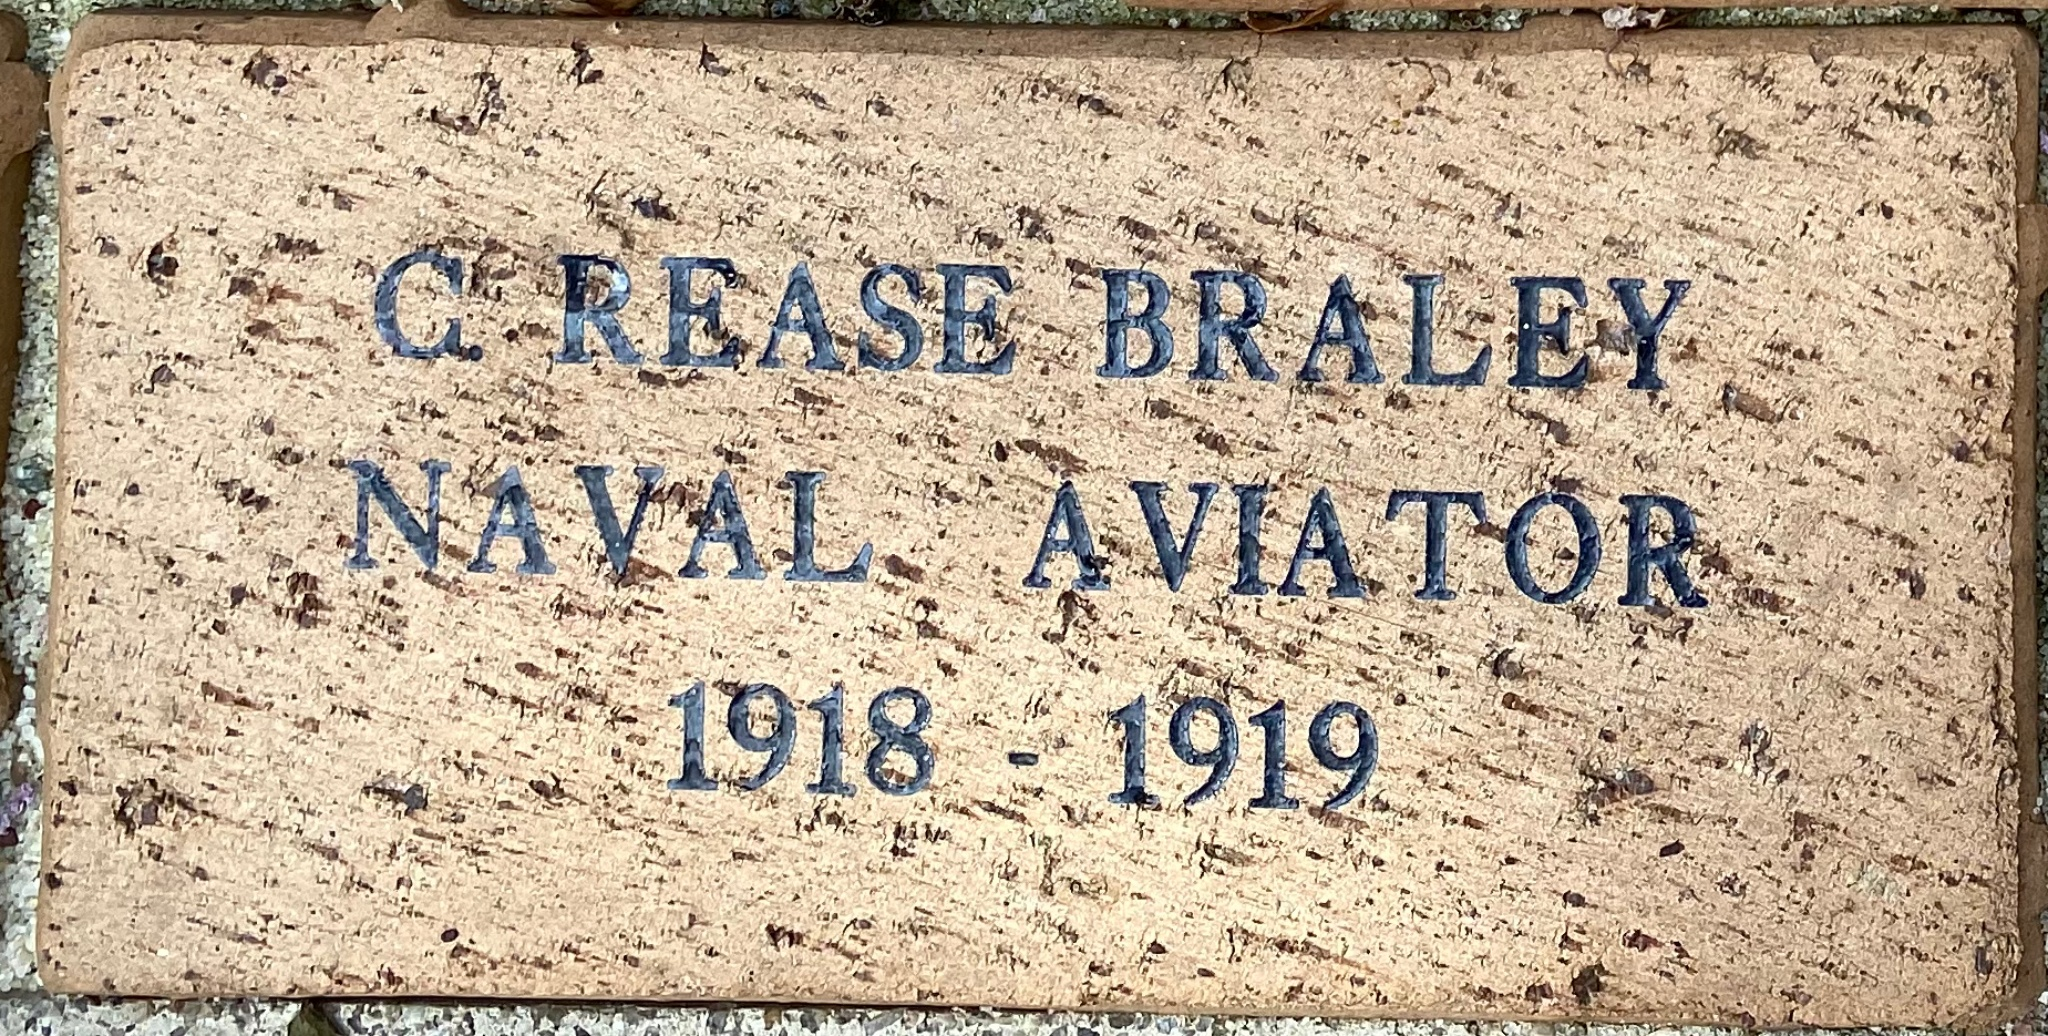 C. REASE BRALEY NAVAL AVIATOR 1918 – 1919